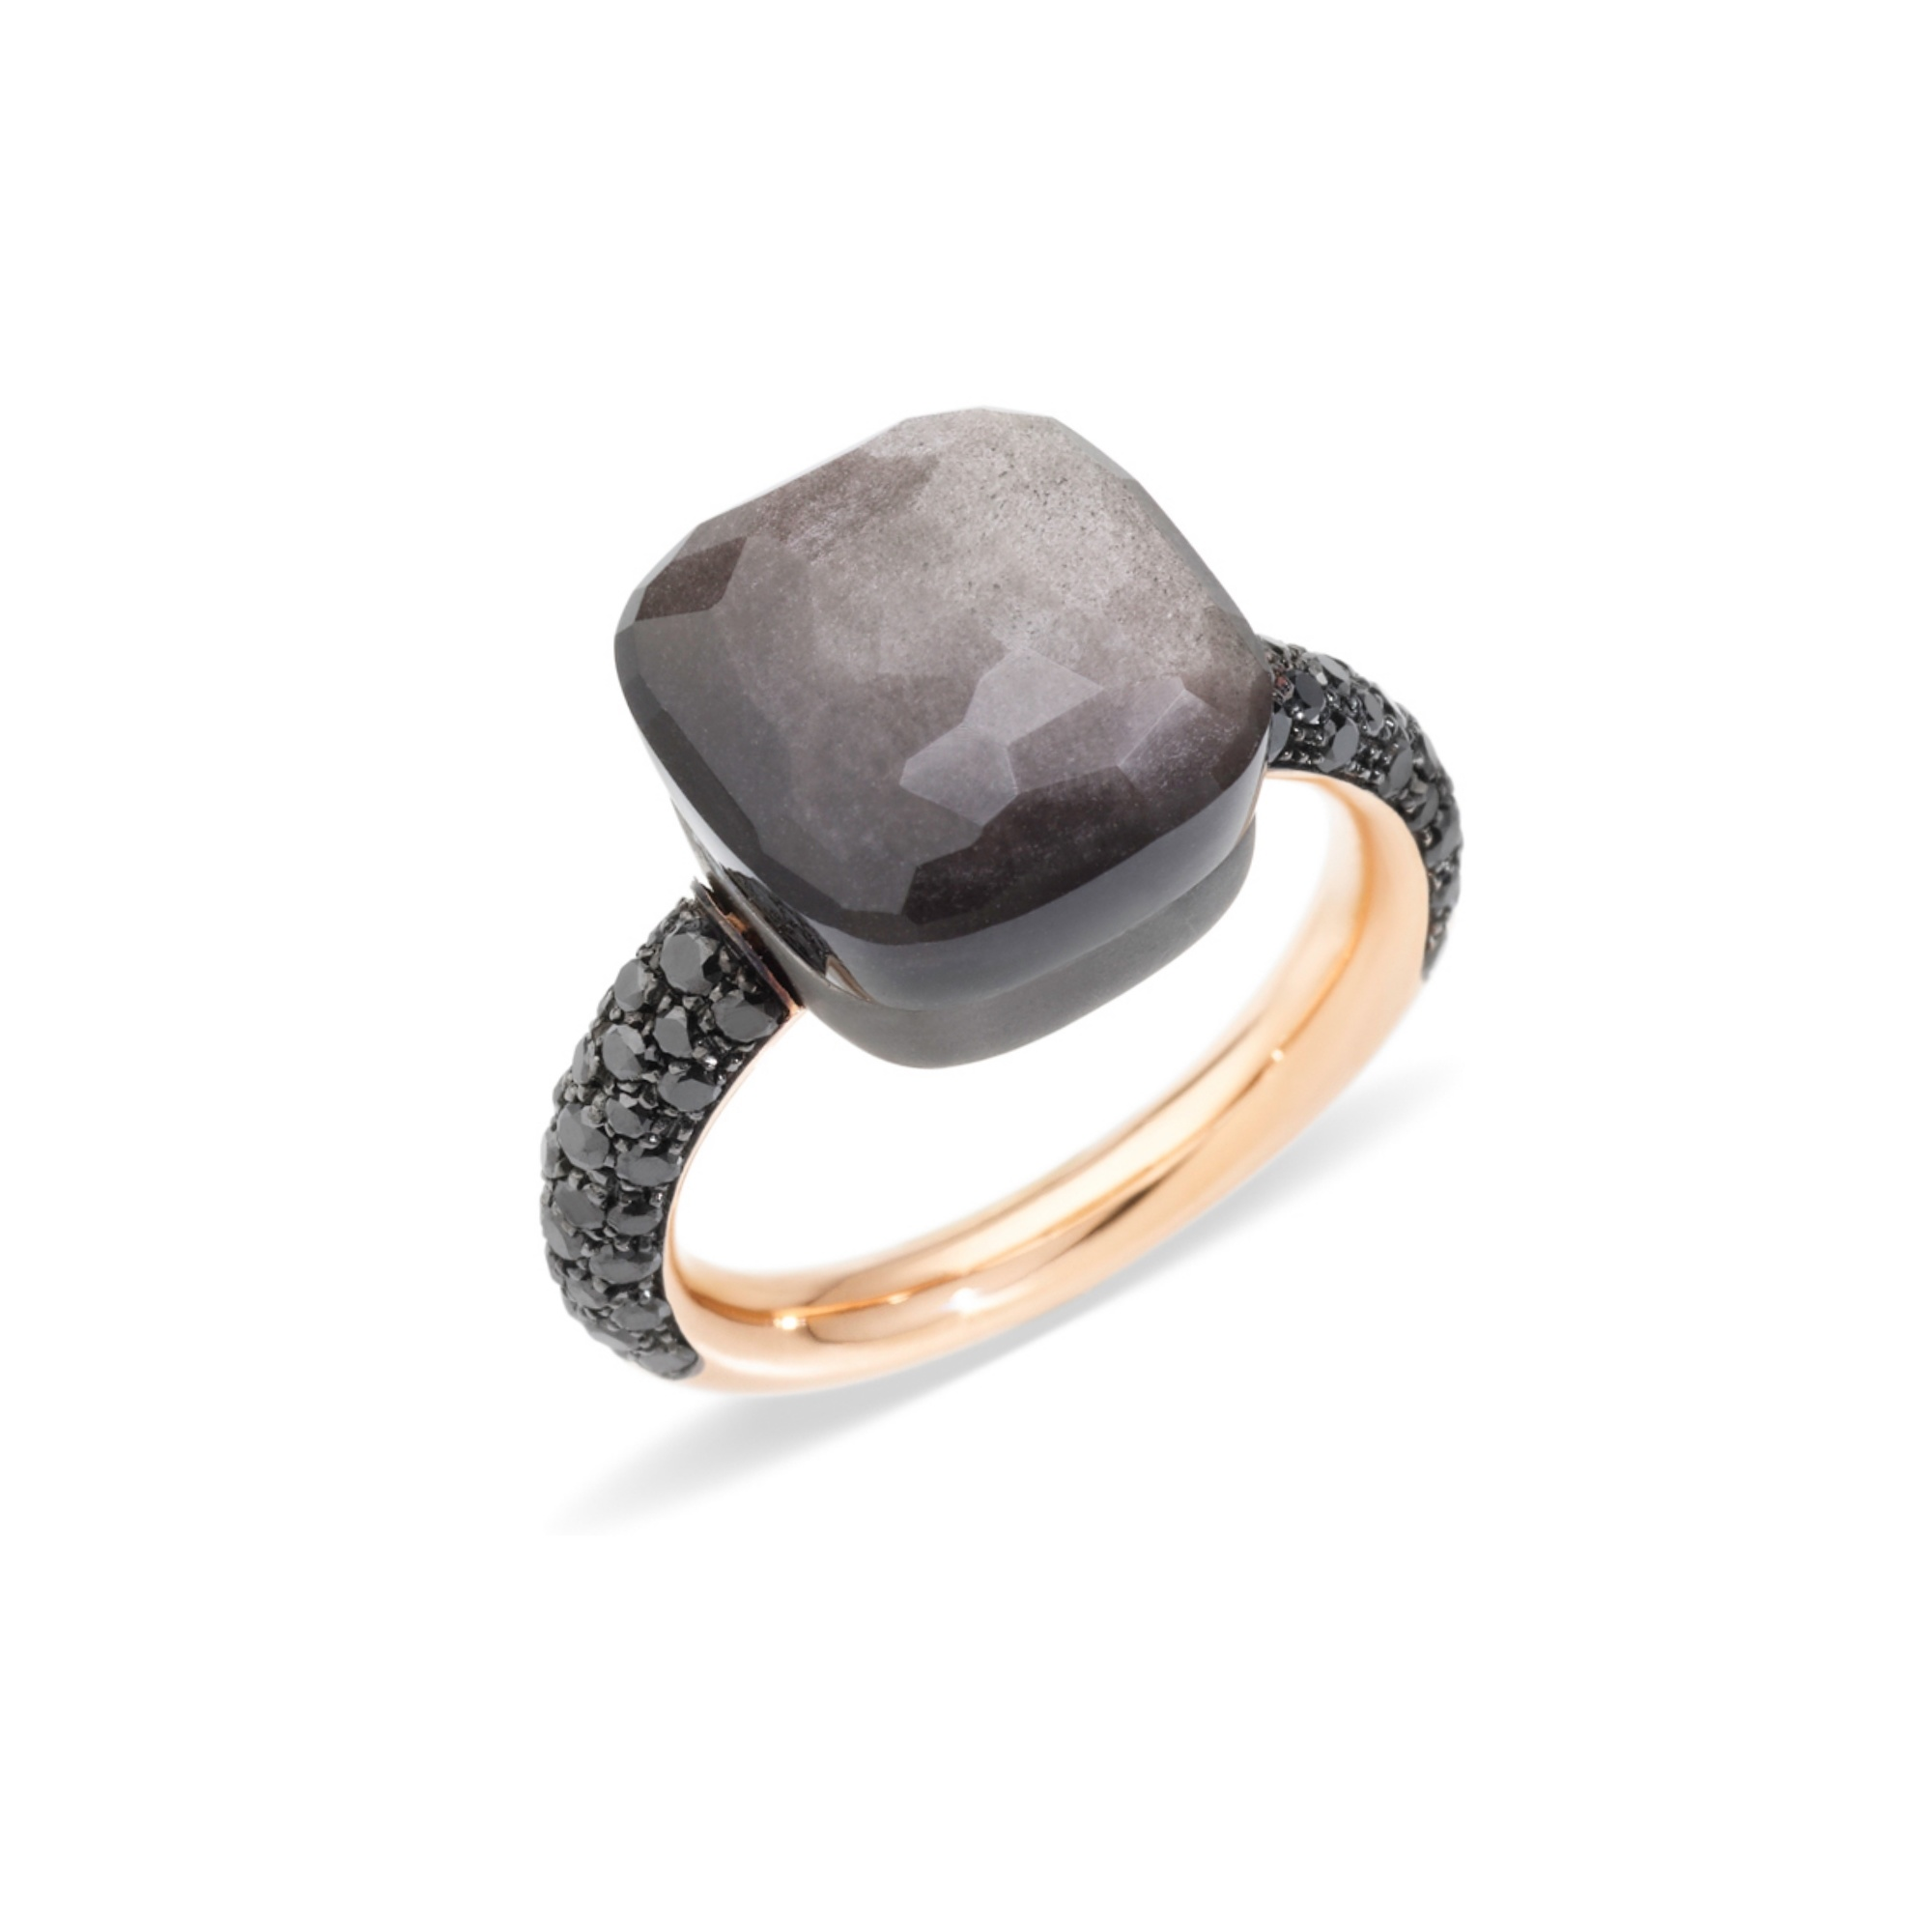 Pomellato Pomellato Nudo Maxi ring Obsidiaan met zwarte diamant gezet in titanium